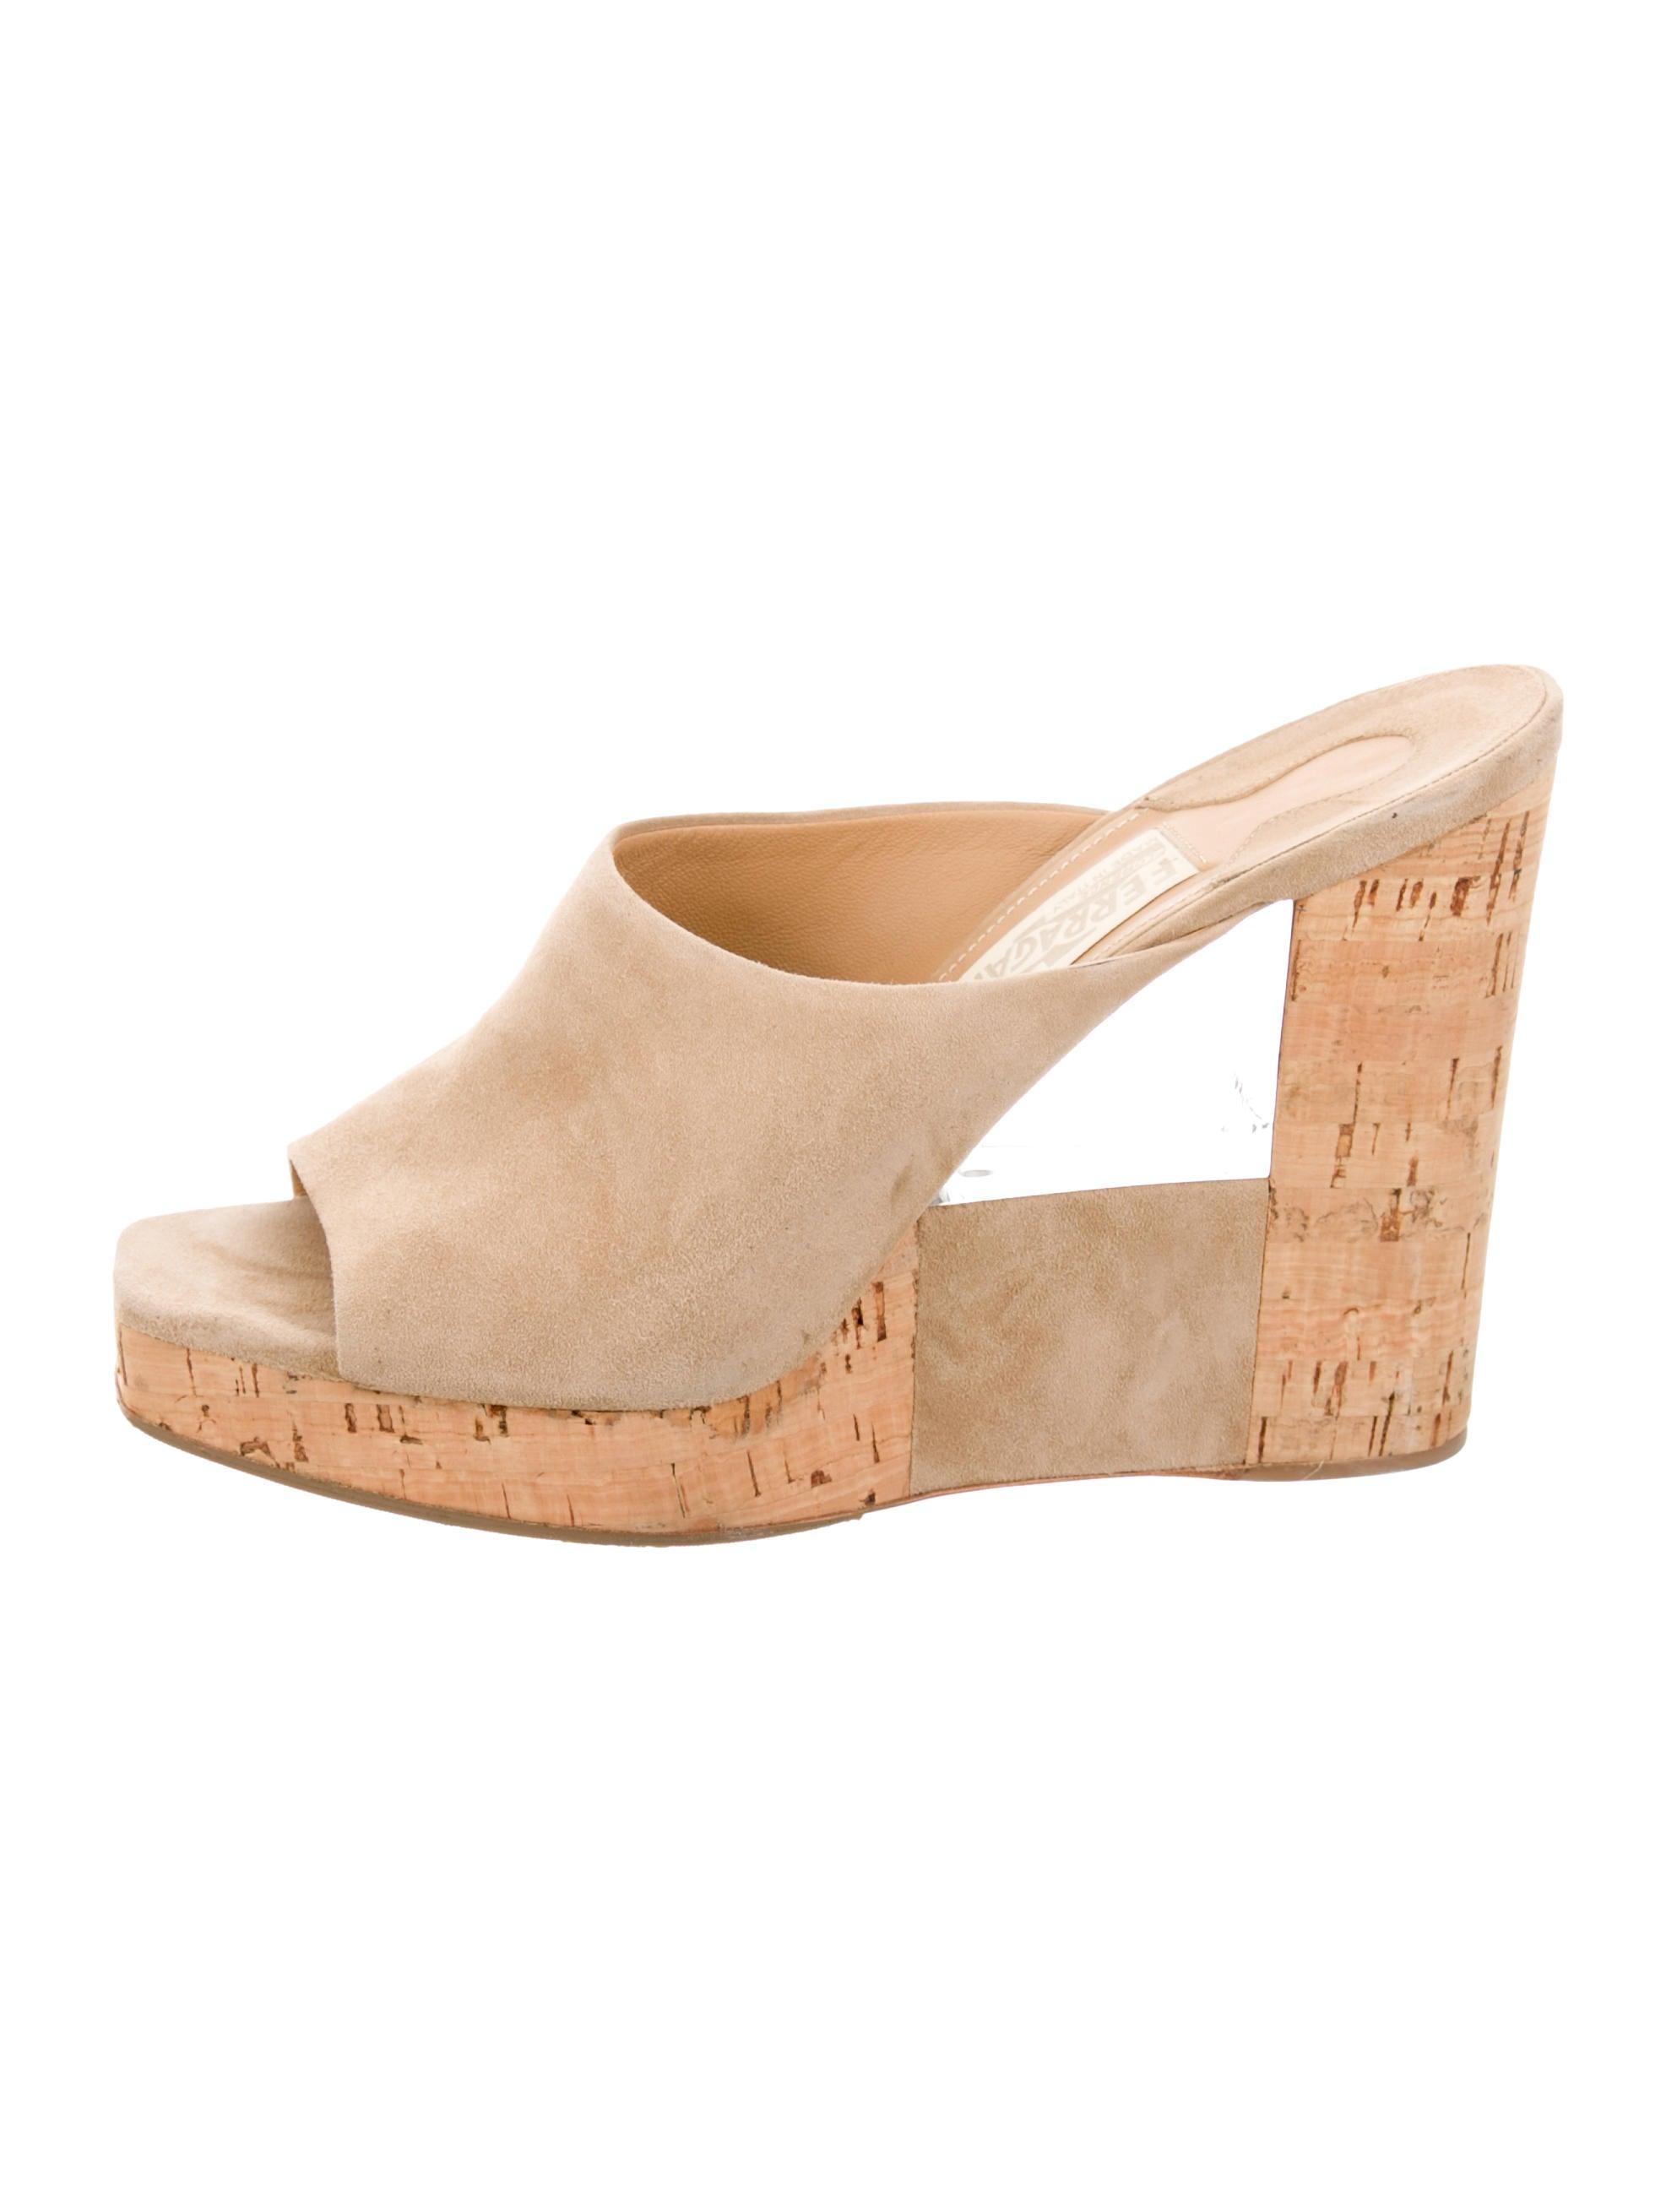 salvatore ferragamo suede slide wedges shoes sal35069